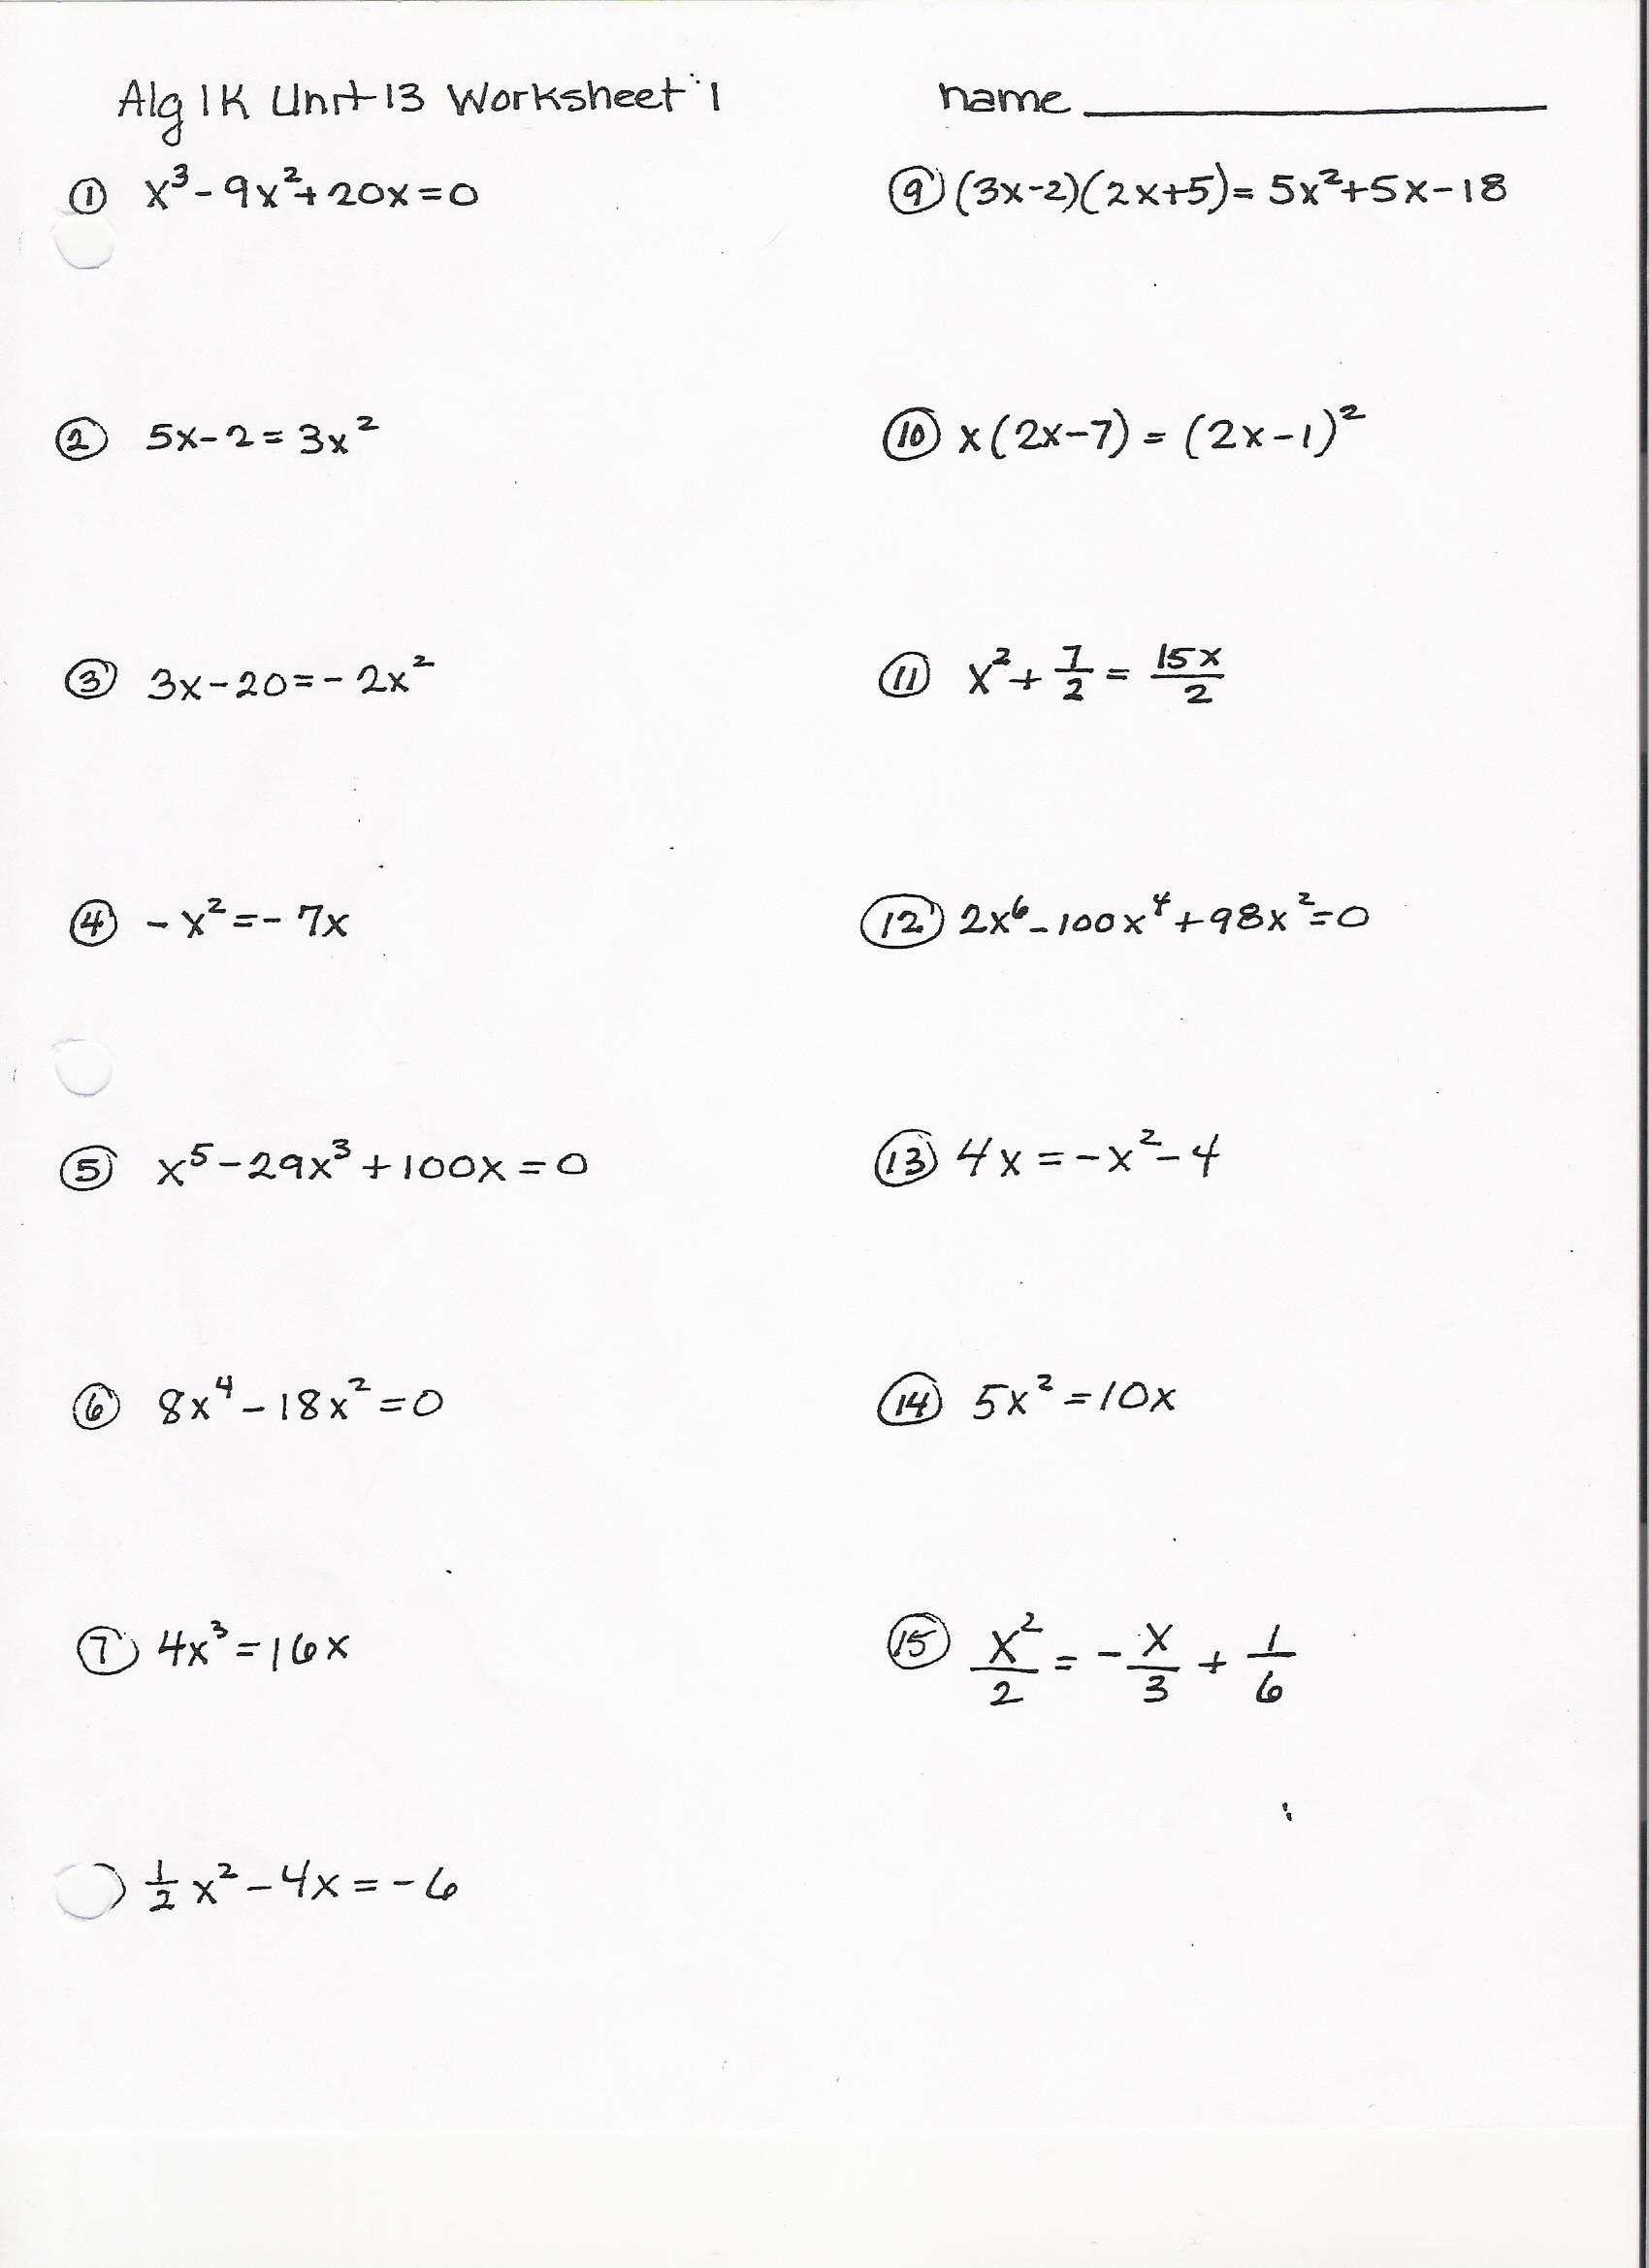 Factoring Worksheet Algebra 1